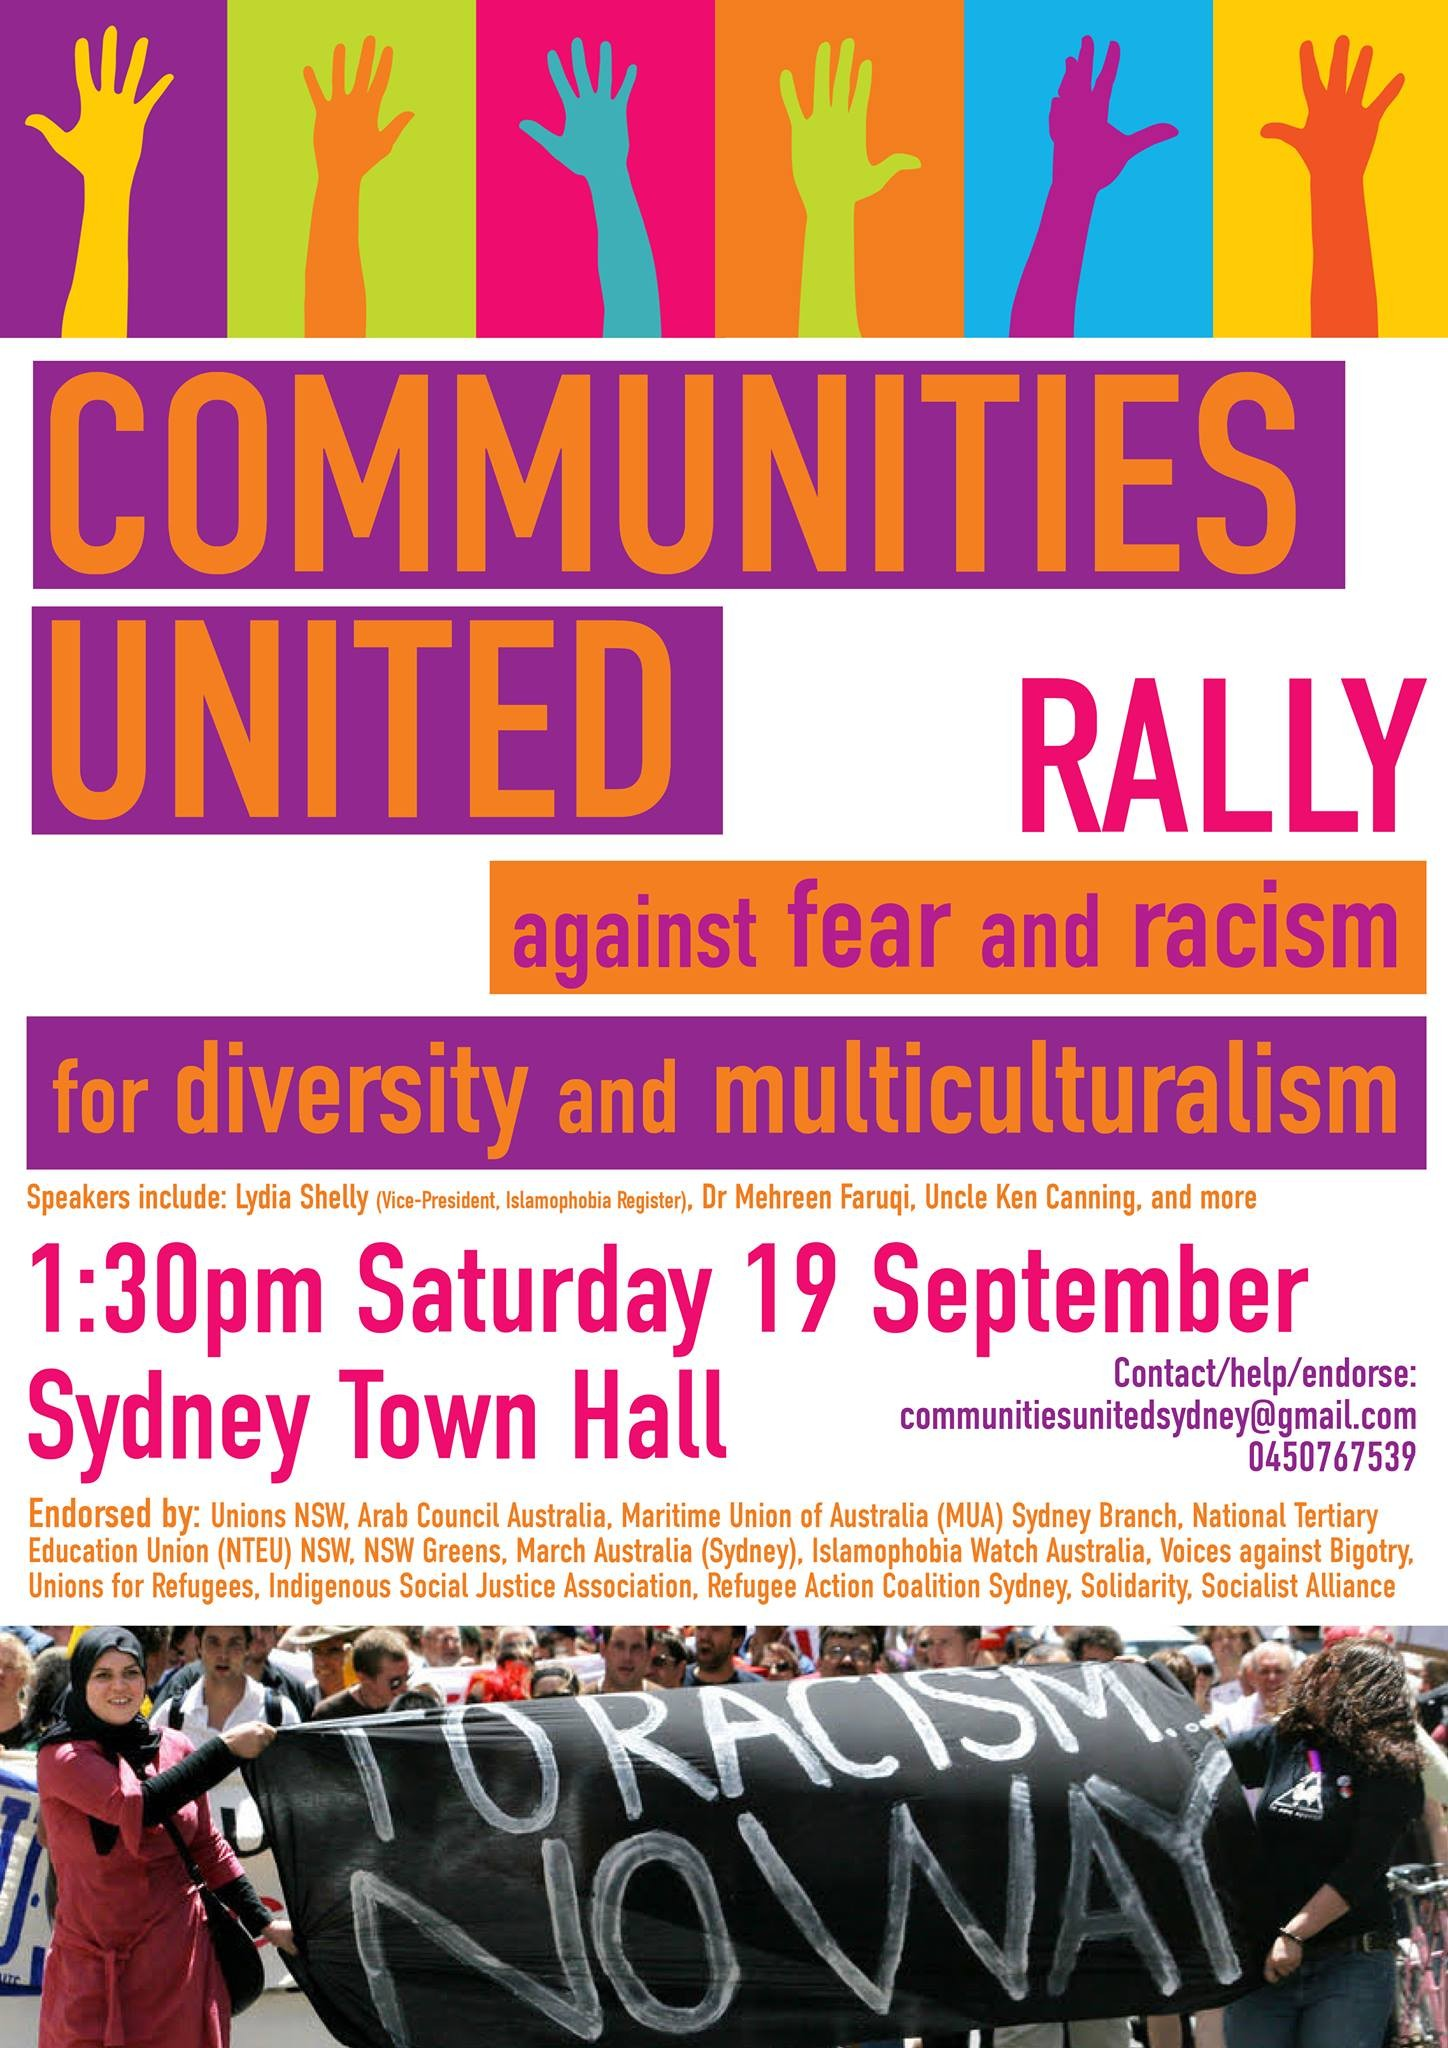 CommunitiesUnited Rally, 19 Sept 2015